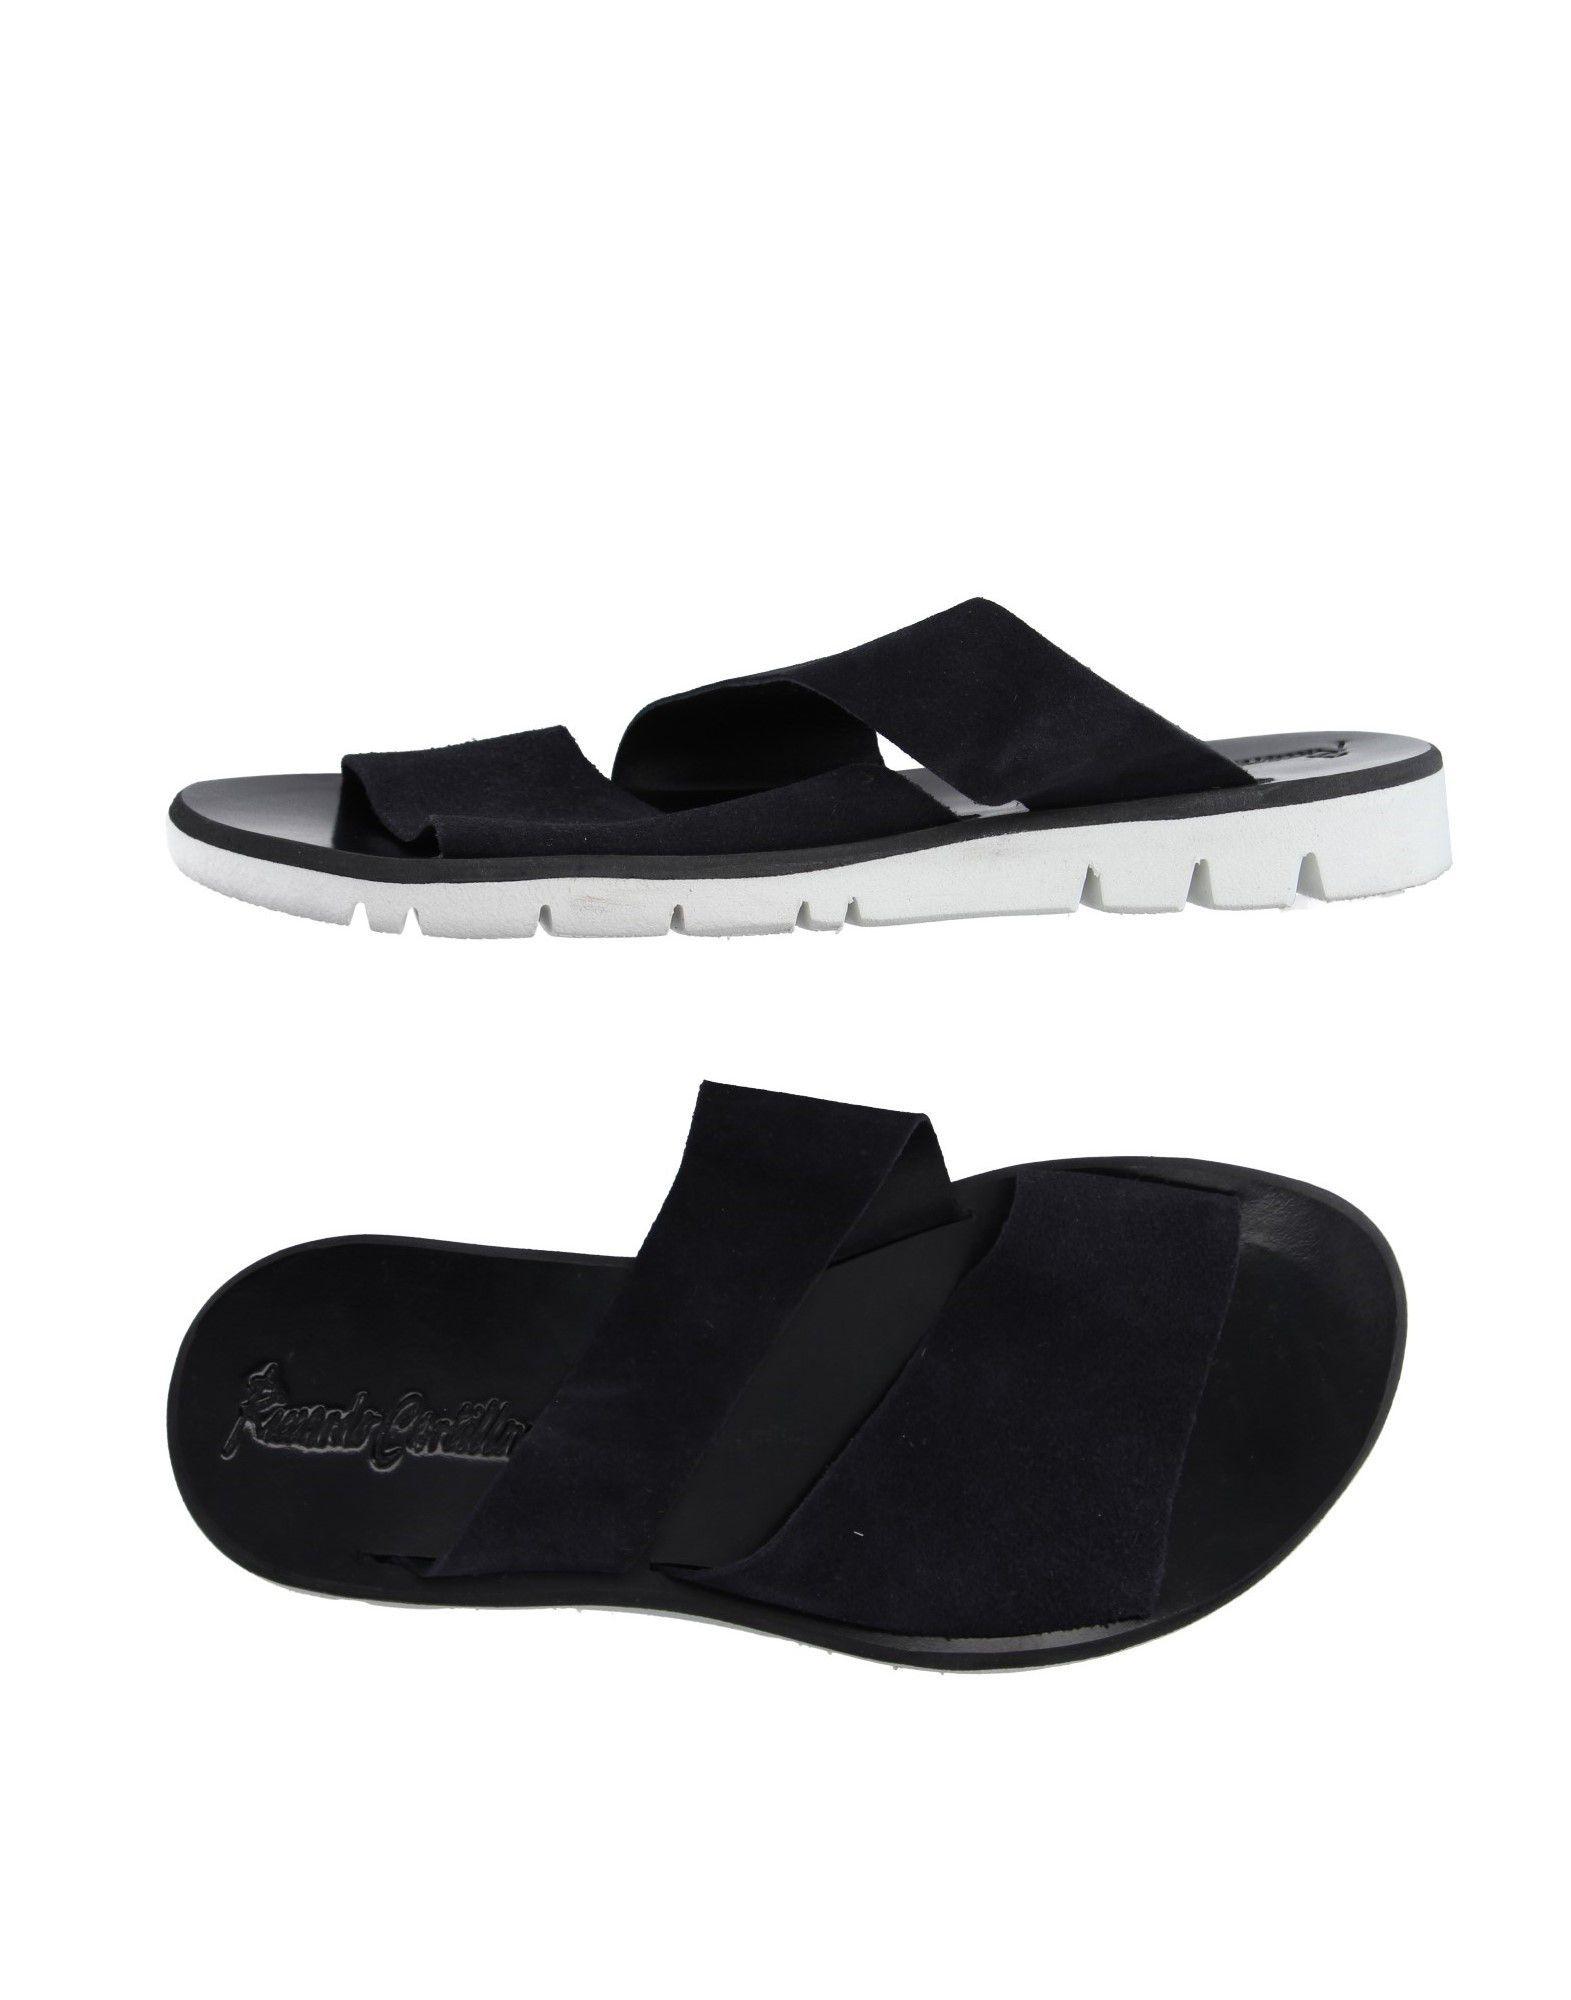 Chaussures - Sandales Cartillone Riccardo pdmpu